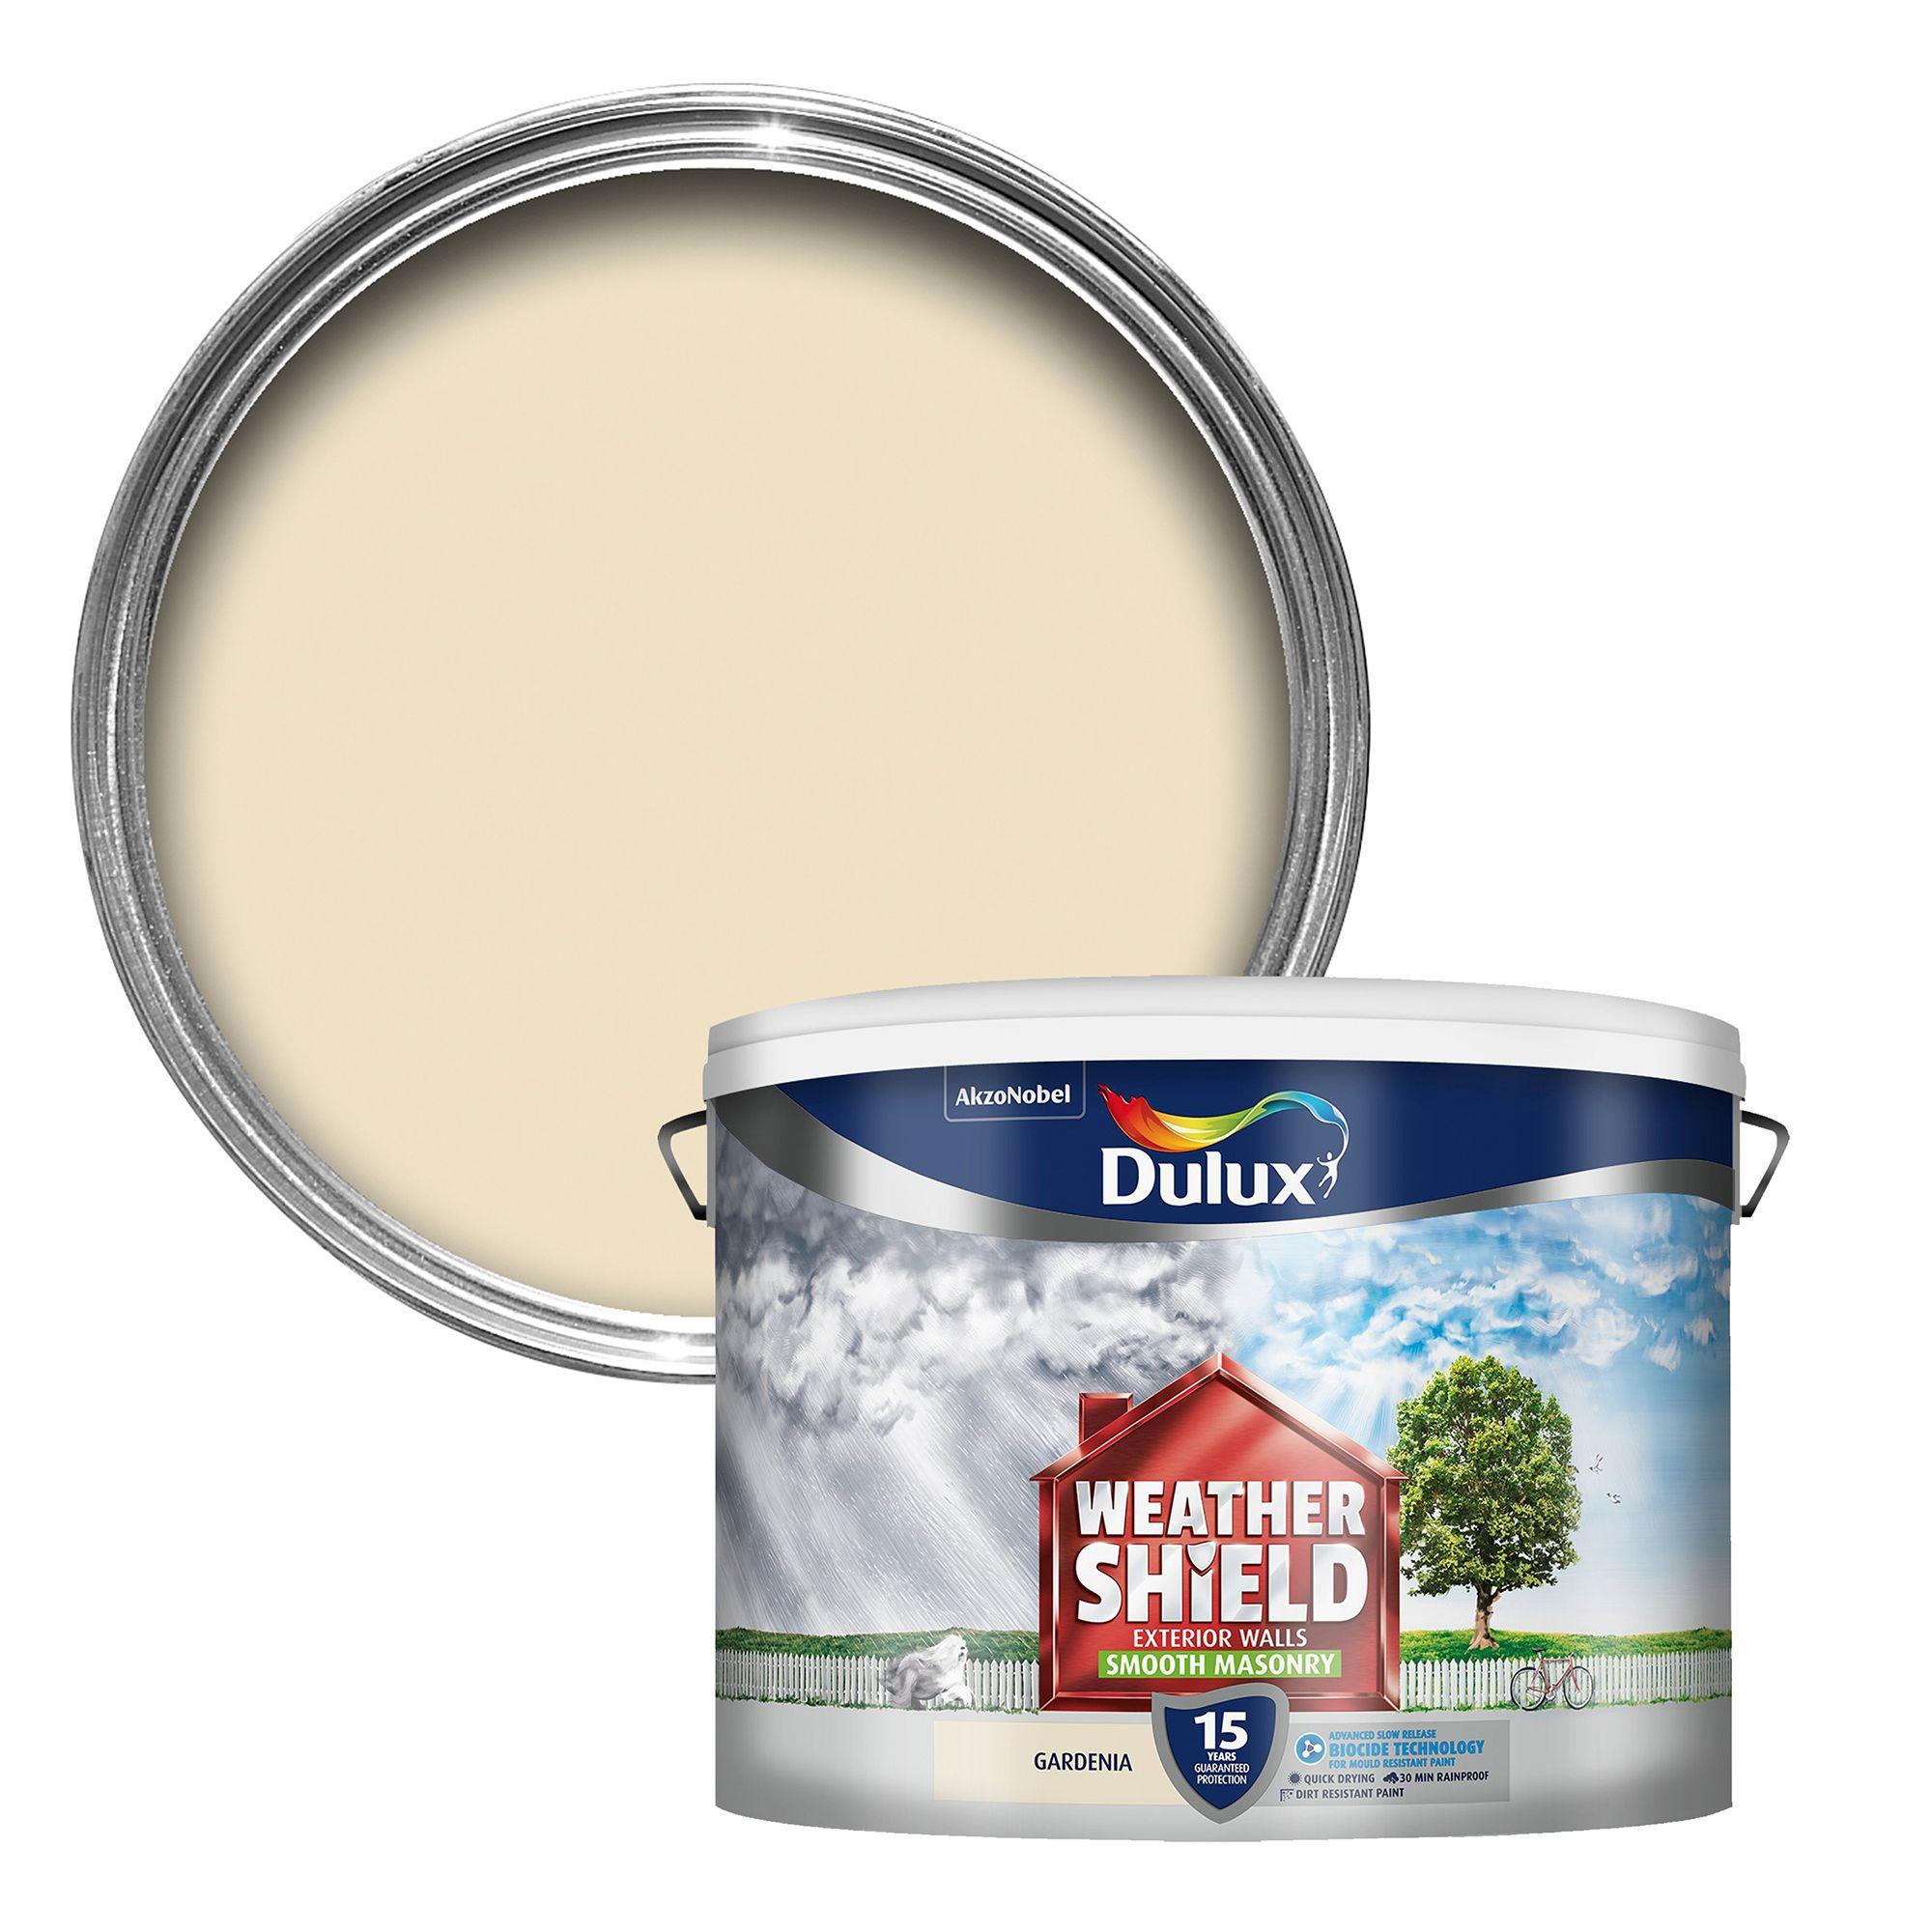 Dulux Weathershield Gardenia Cream Smooth Masonry Paint 10L - Departments